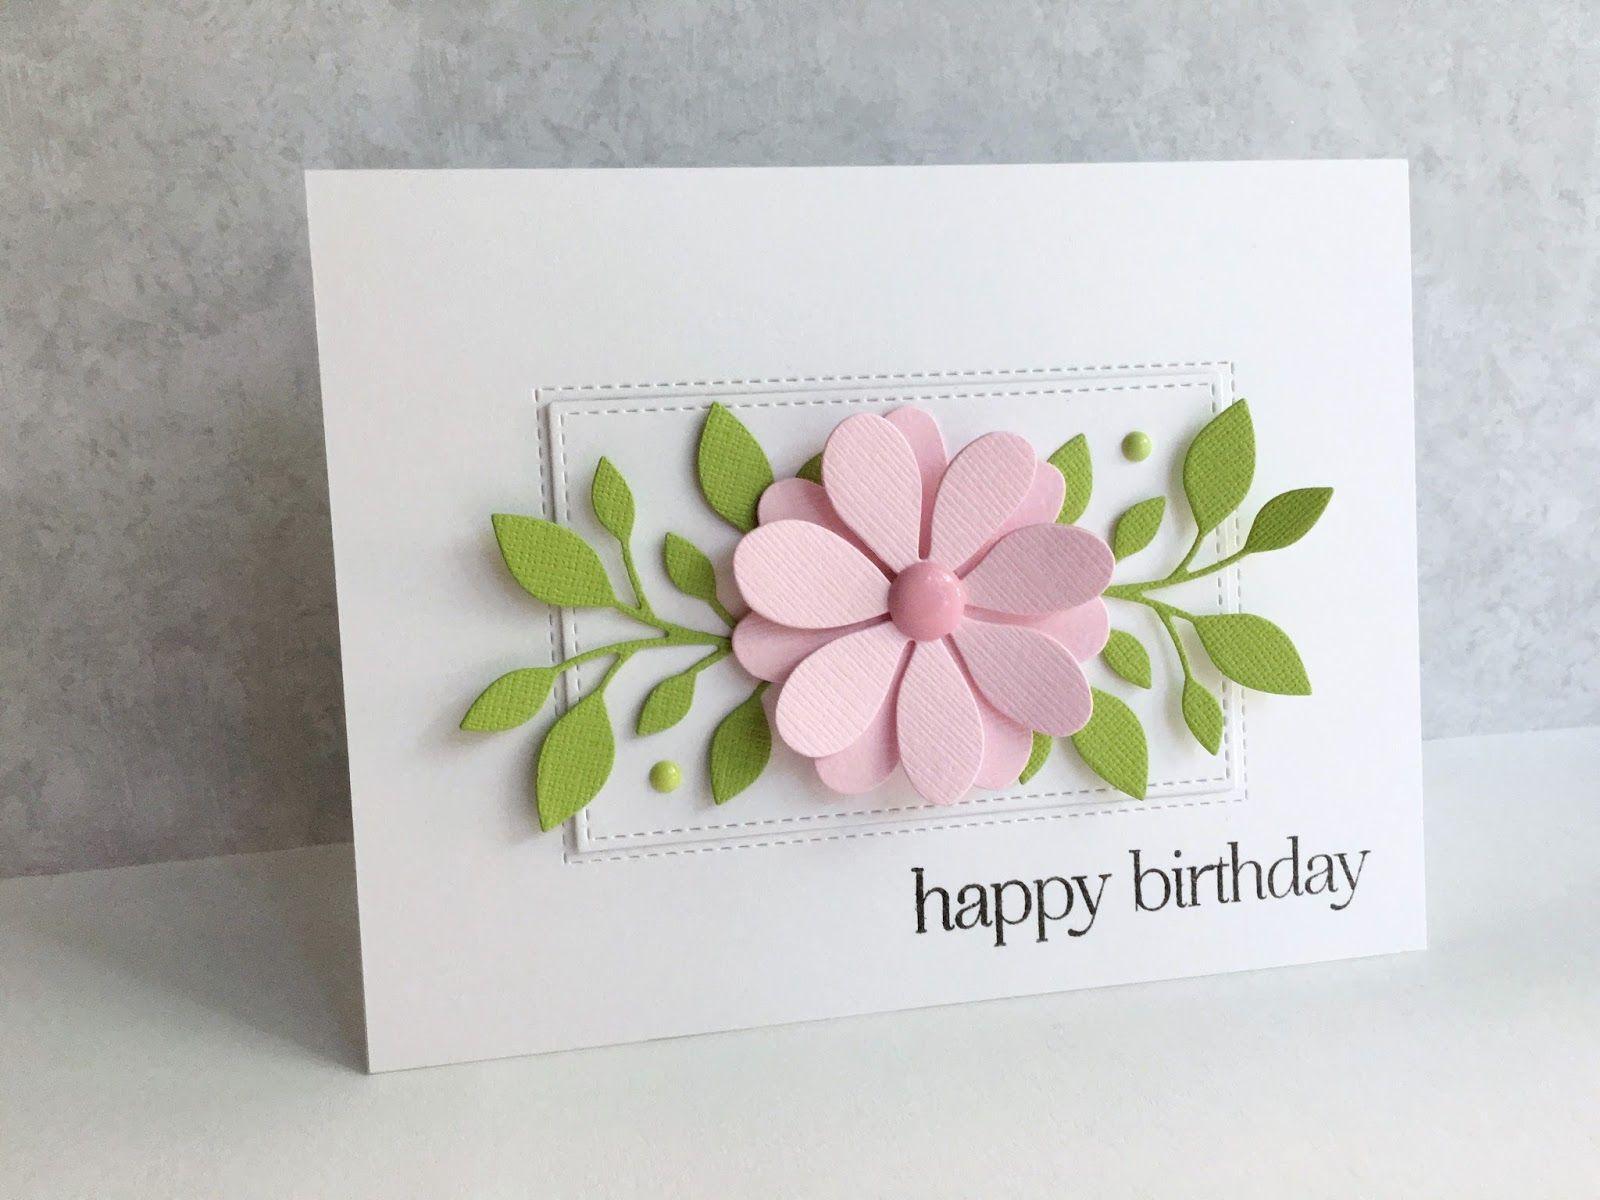 Ium in haven a birthday flower carterie pinterest stamps